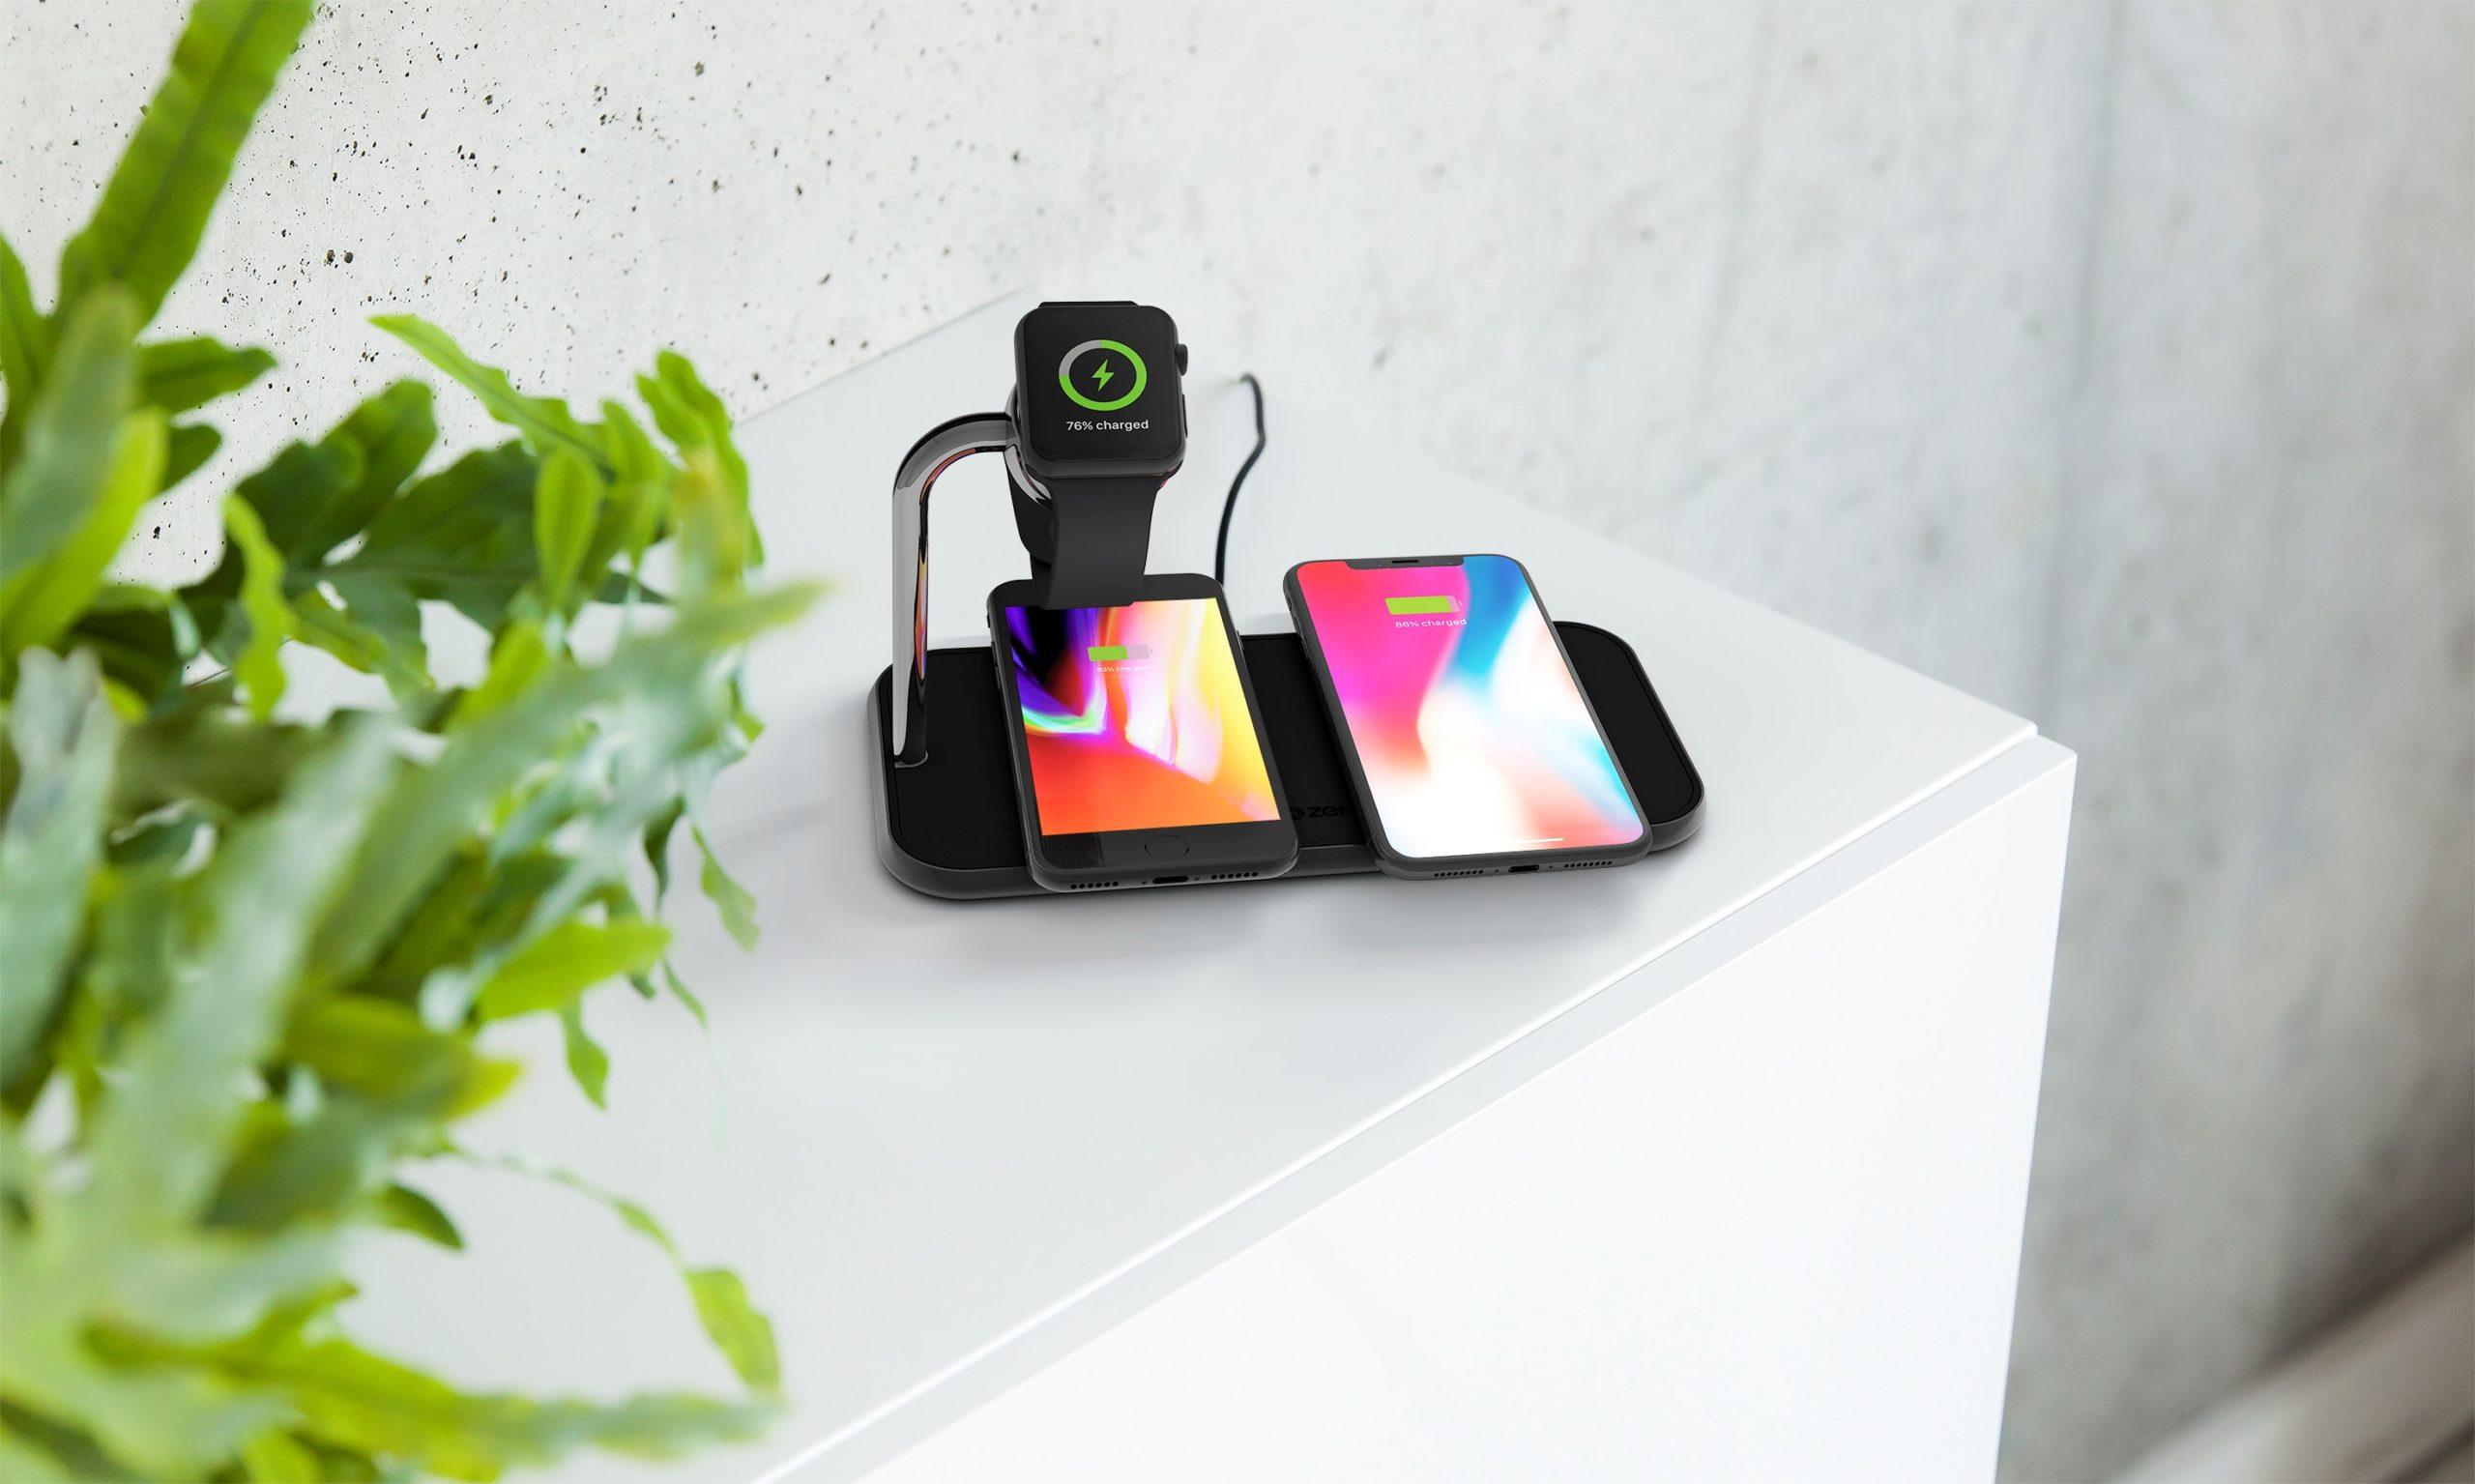 ZENS Dual Aluminium Wireless Charger Lifestyle Image